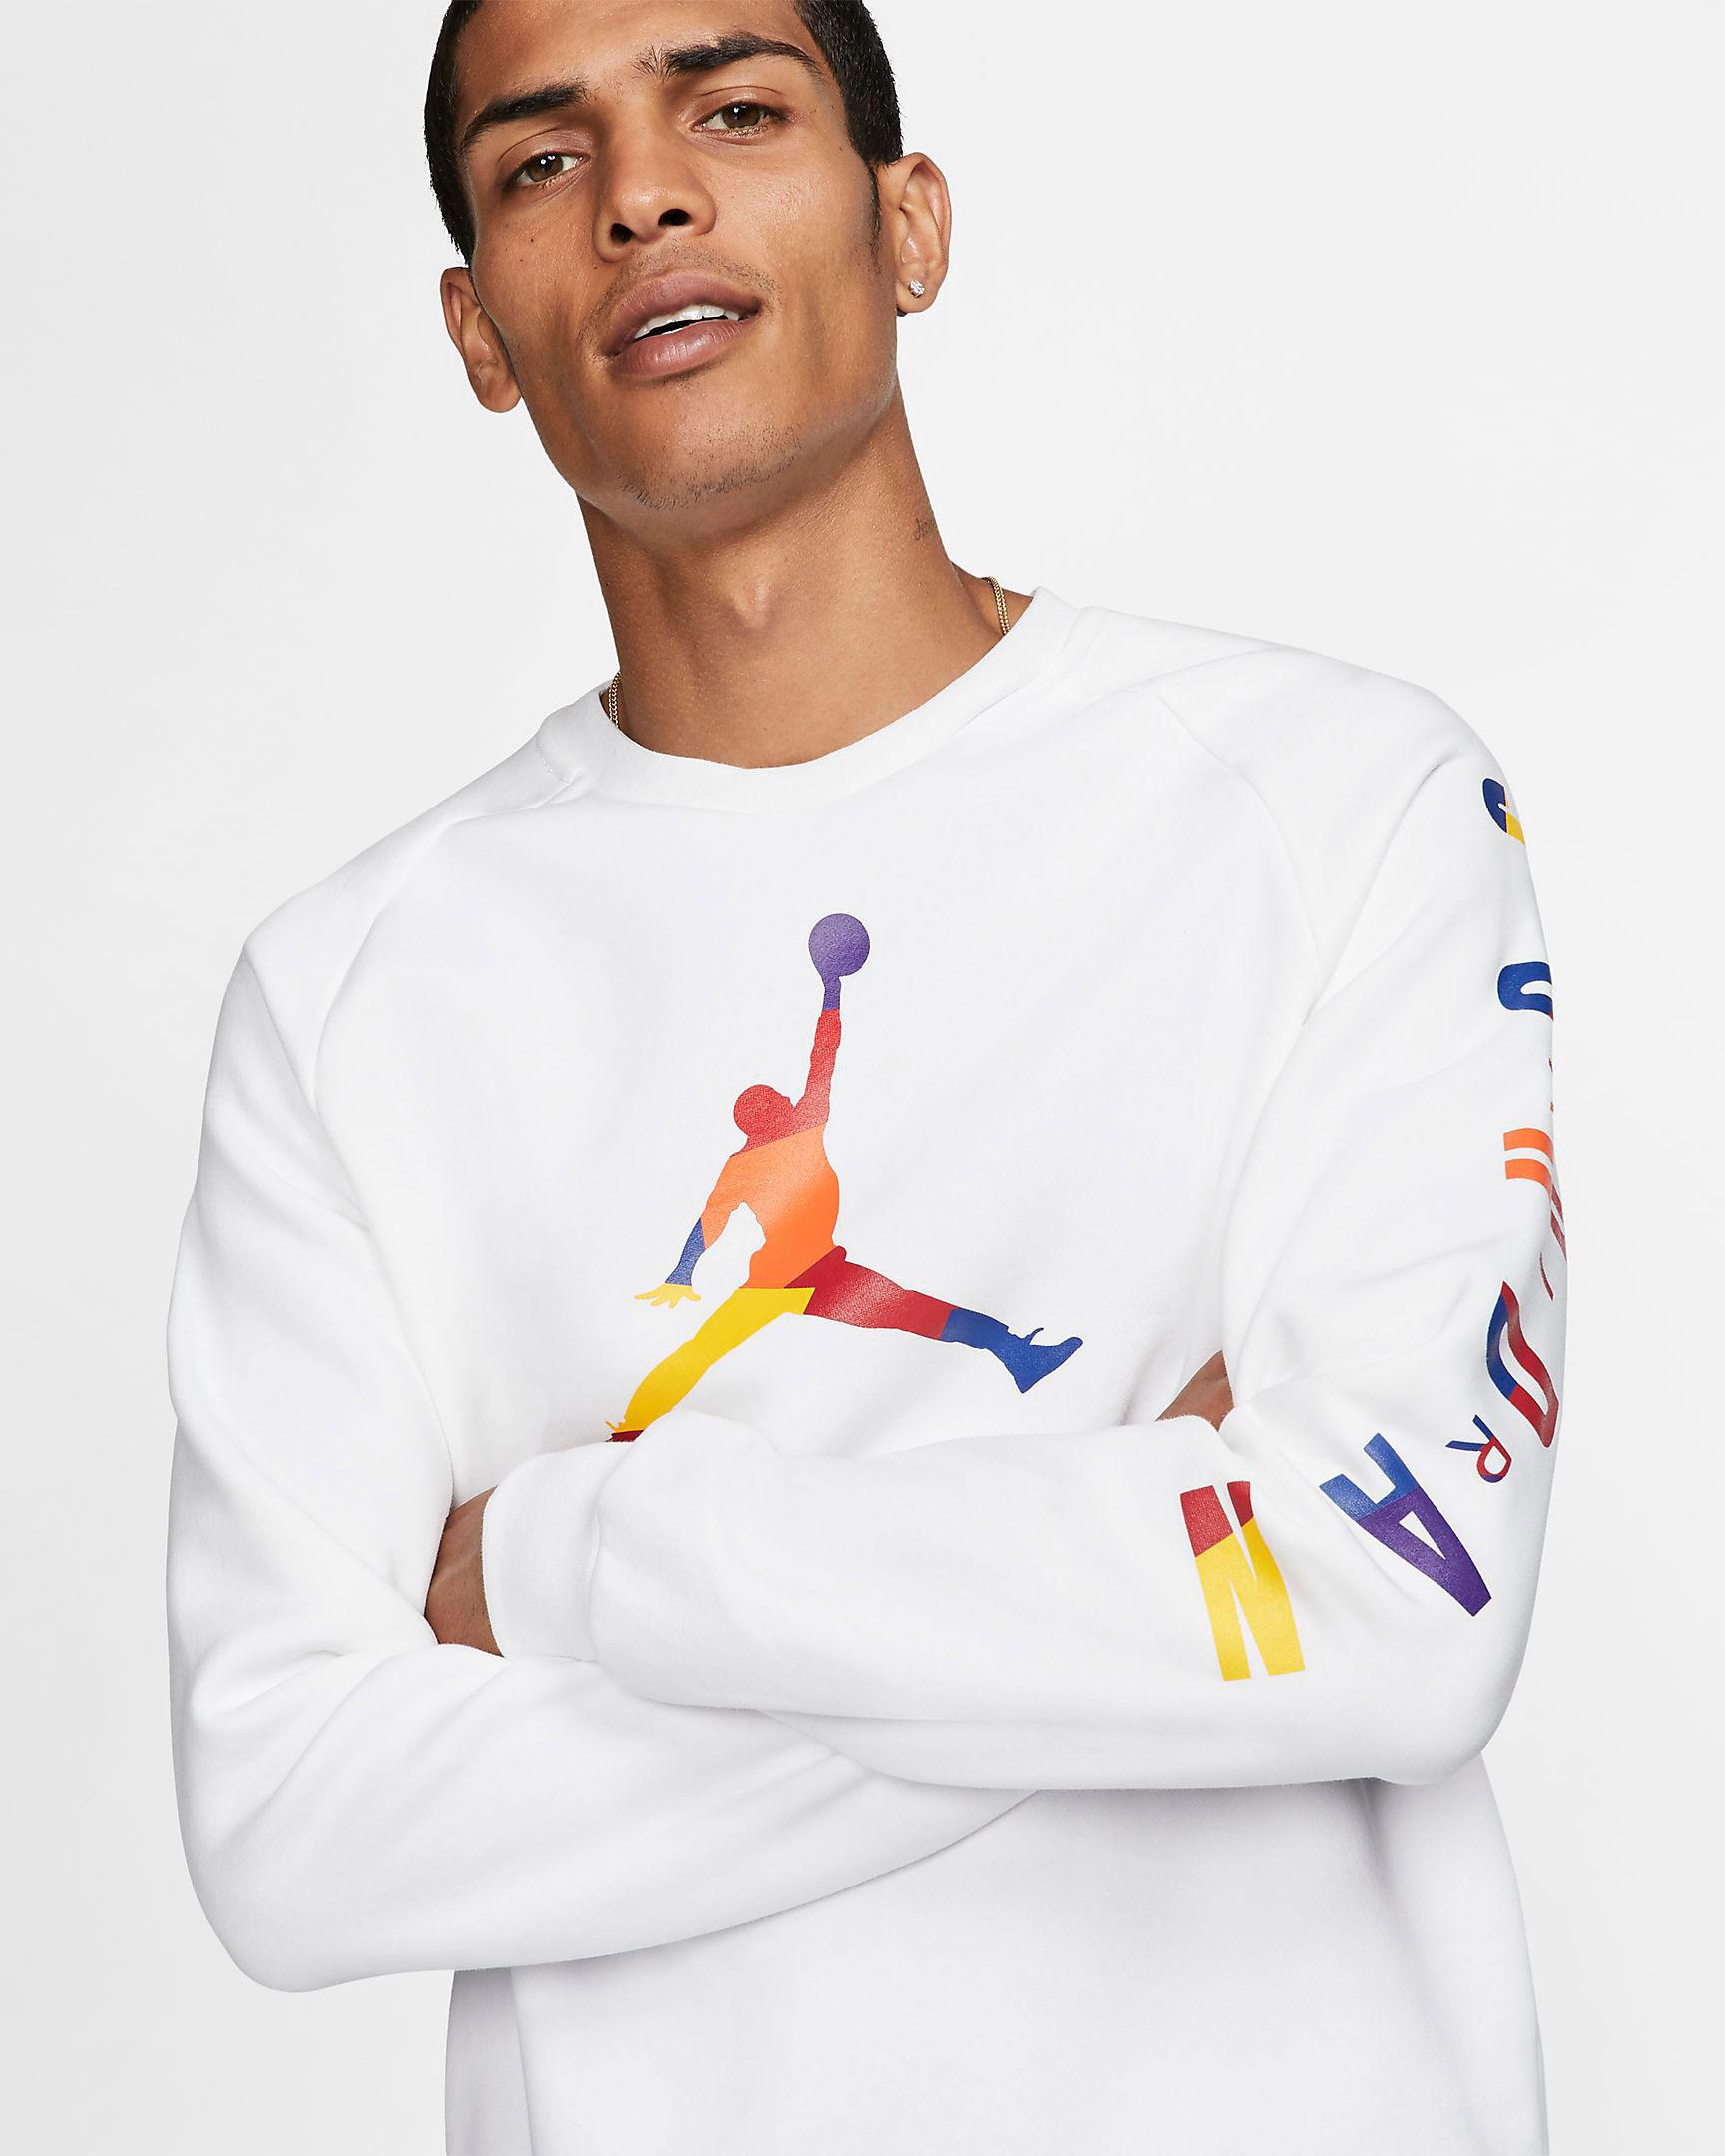 lakers-jordan-13-rivals-sweatshirt-white